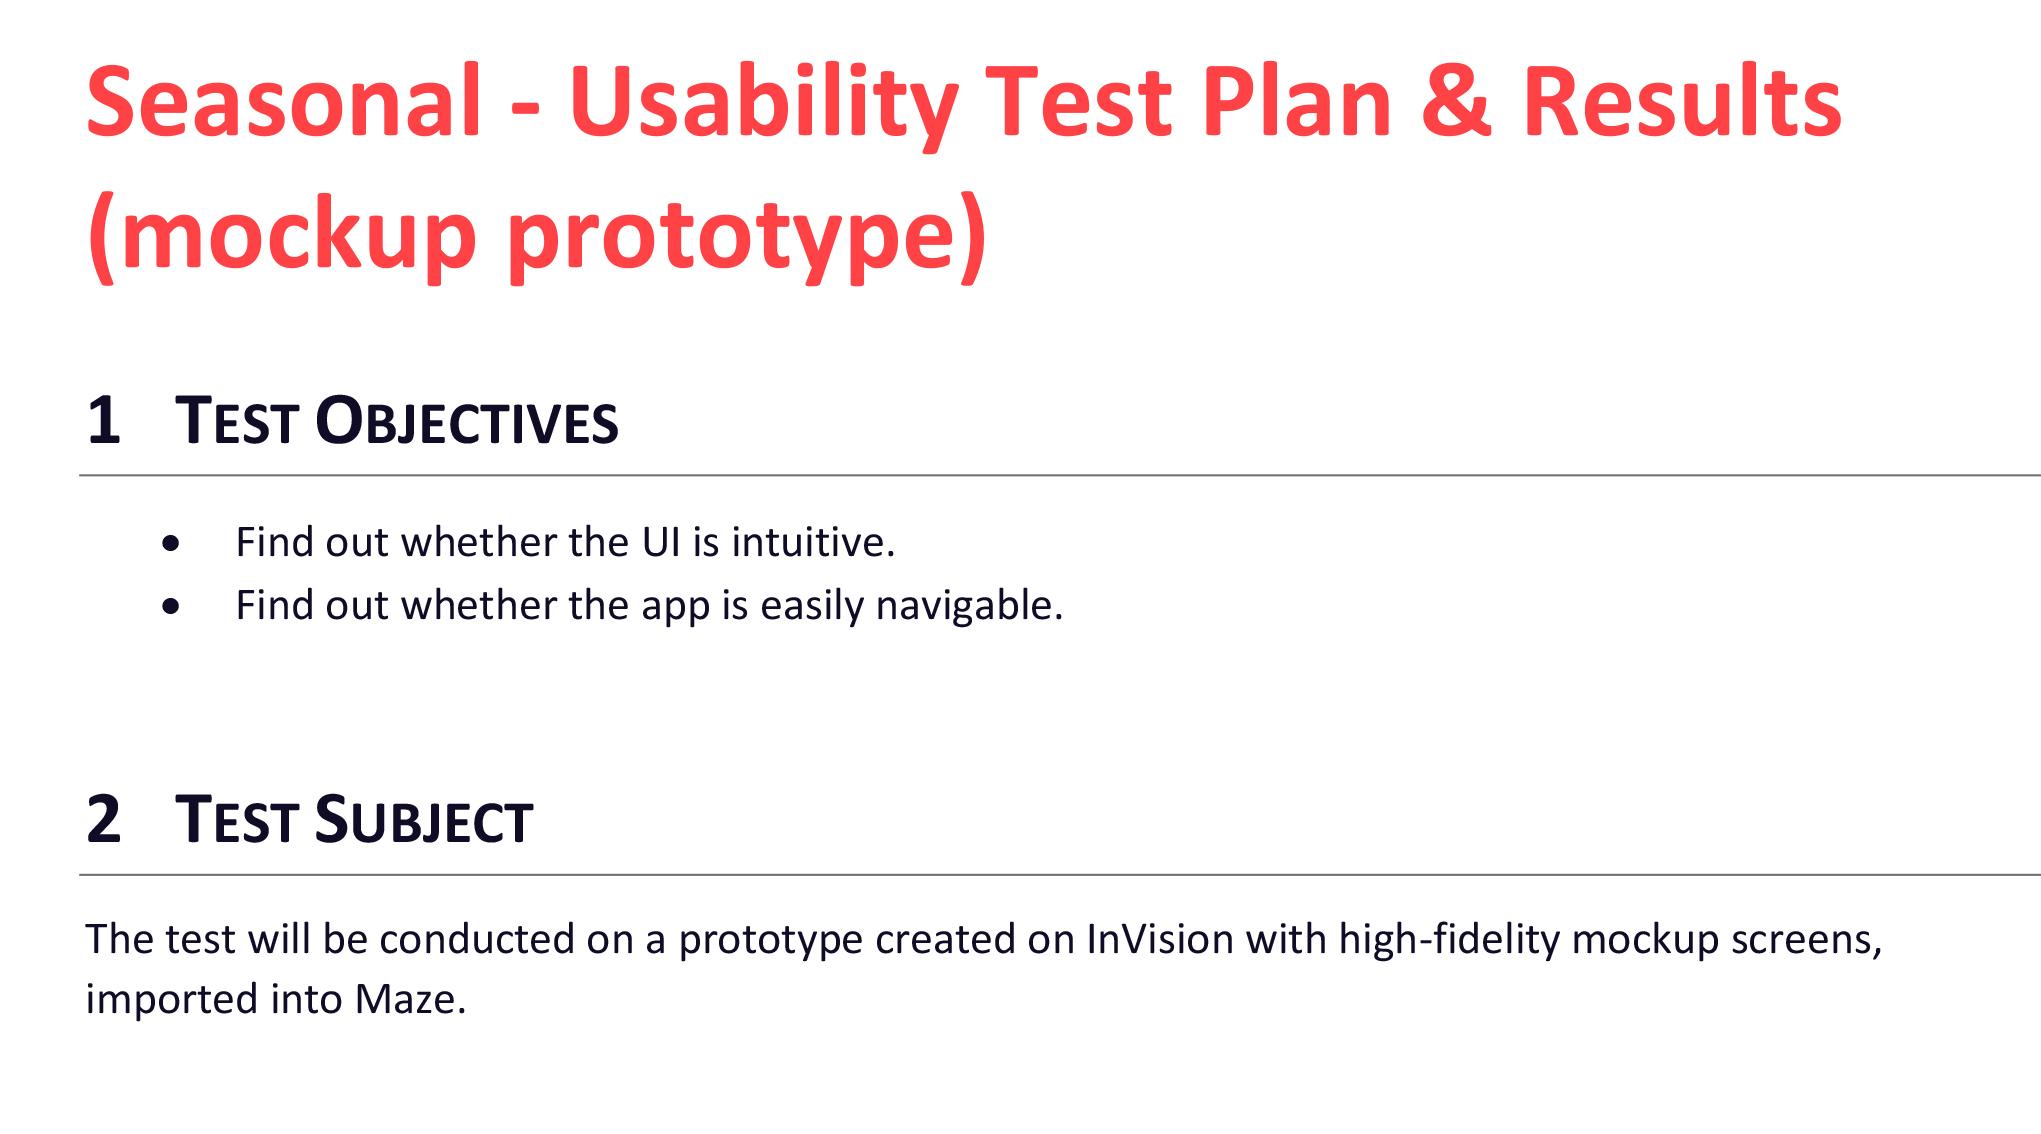 seasonal_usability_test_results_mockup-v20200426-1